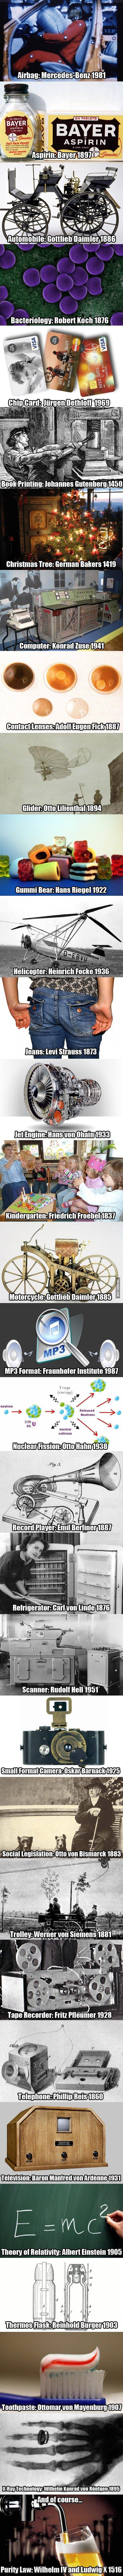 Great german inventions. Jetzt könnt ihr euch in den Kommentaren austoben, ihr Nazis... The first airbag patent was made by an American 3 months before Walter Linderer(German) patented his. The first mechanized automobile was steam powered, and was